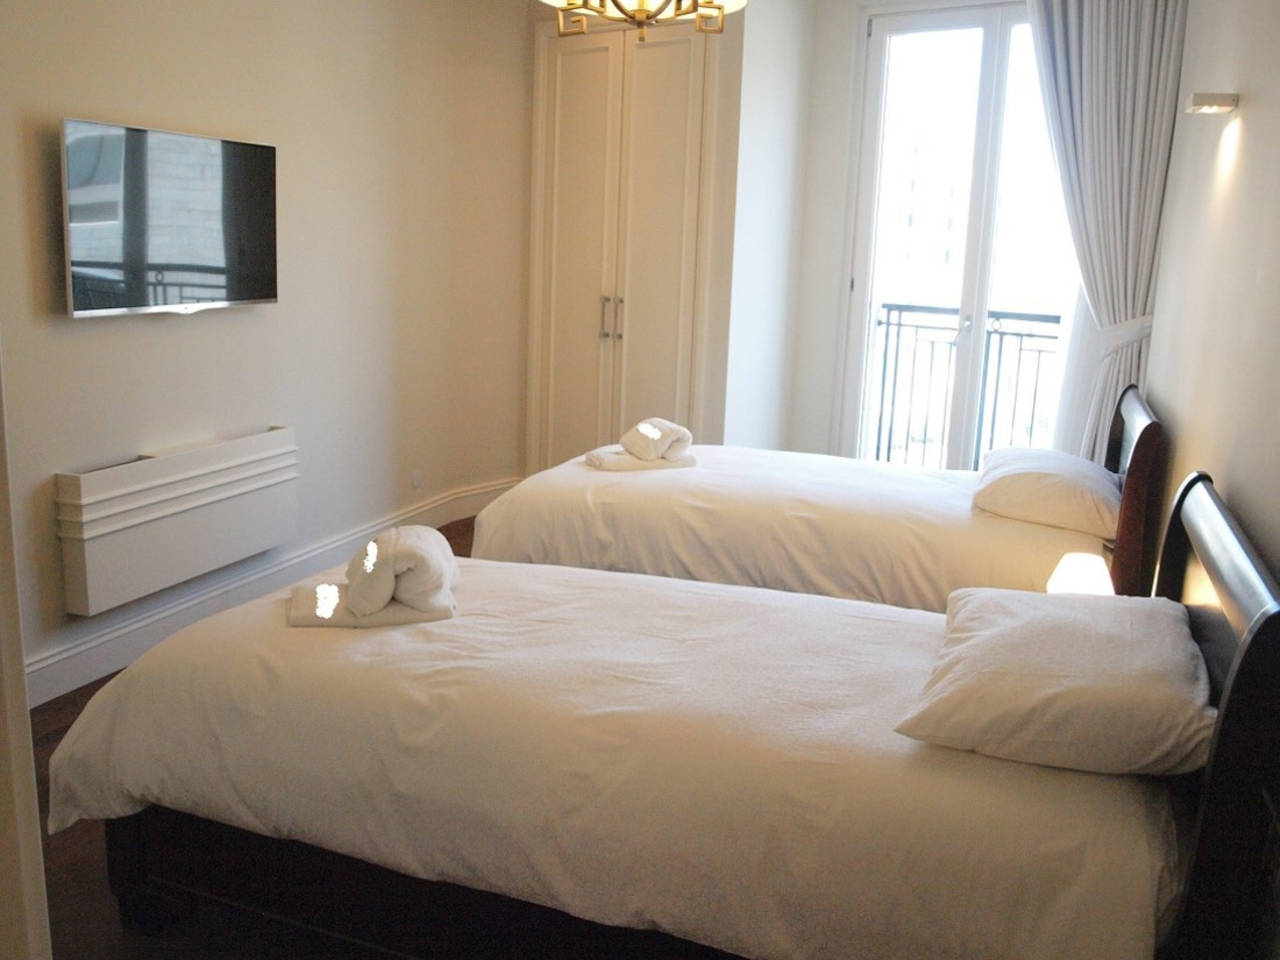 Apartment Great Location - Mamilla Mall Super Luxurious Flat photo 15809463